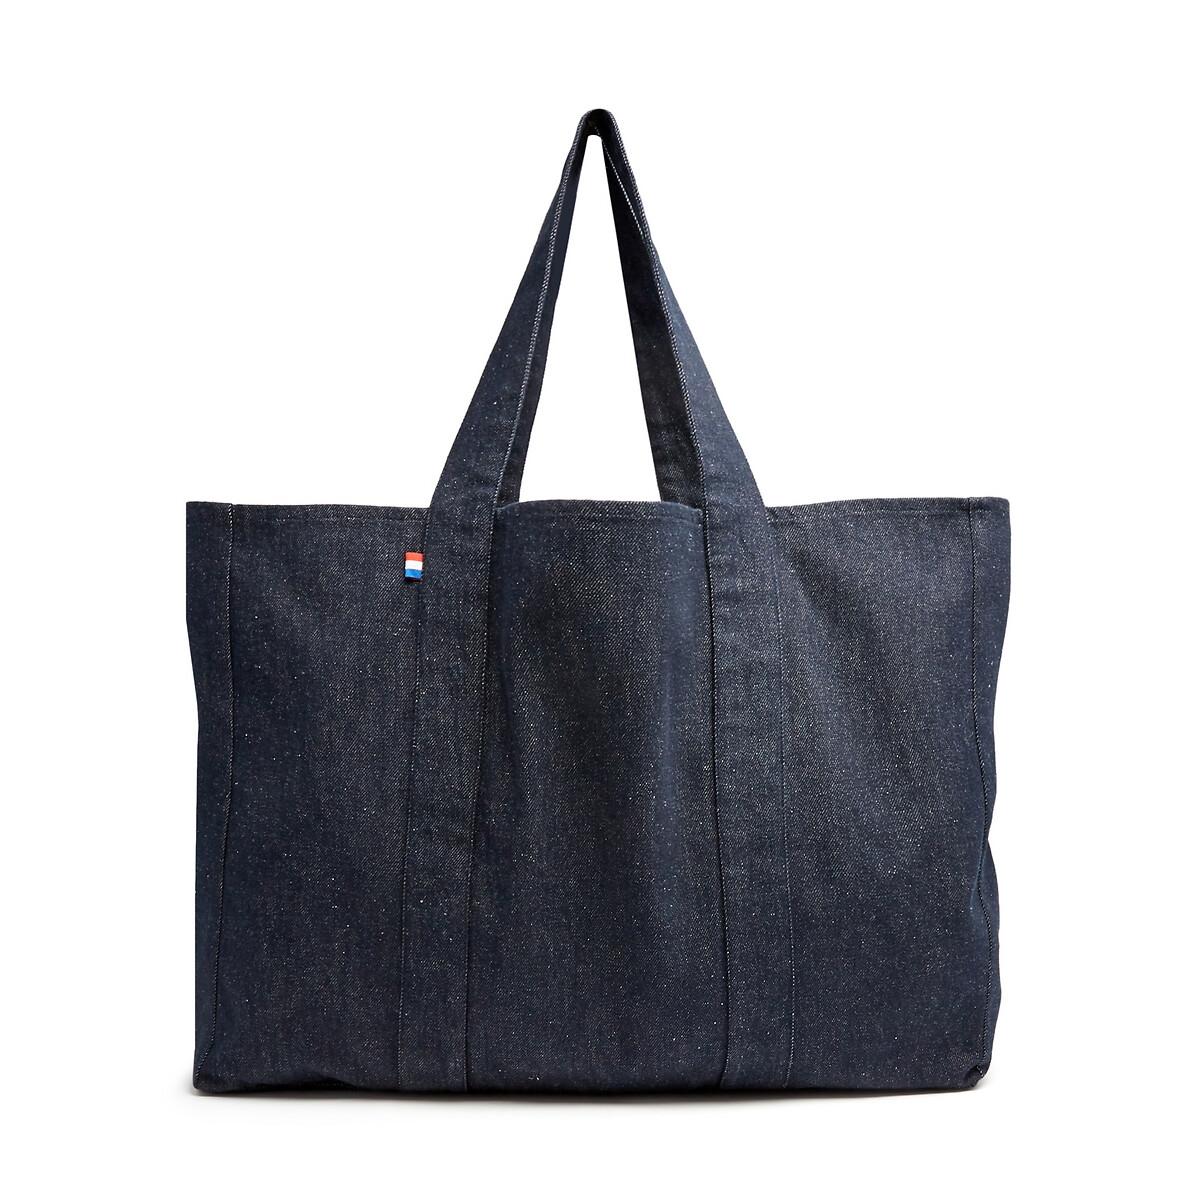 Сумка-шоппер La Redoute Джинсовая Made in France единый размер синий сумка la redoute кожаная sunny foil единый размер синий